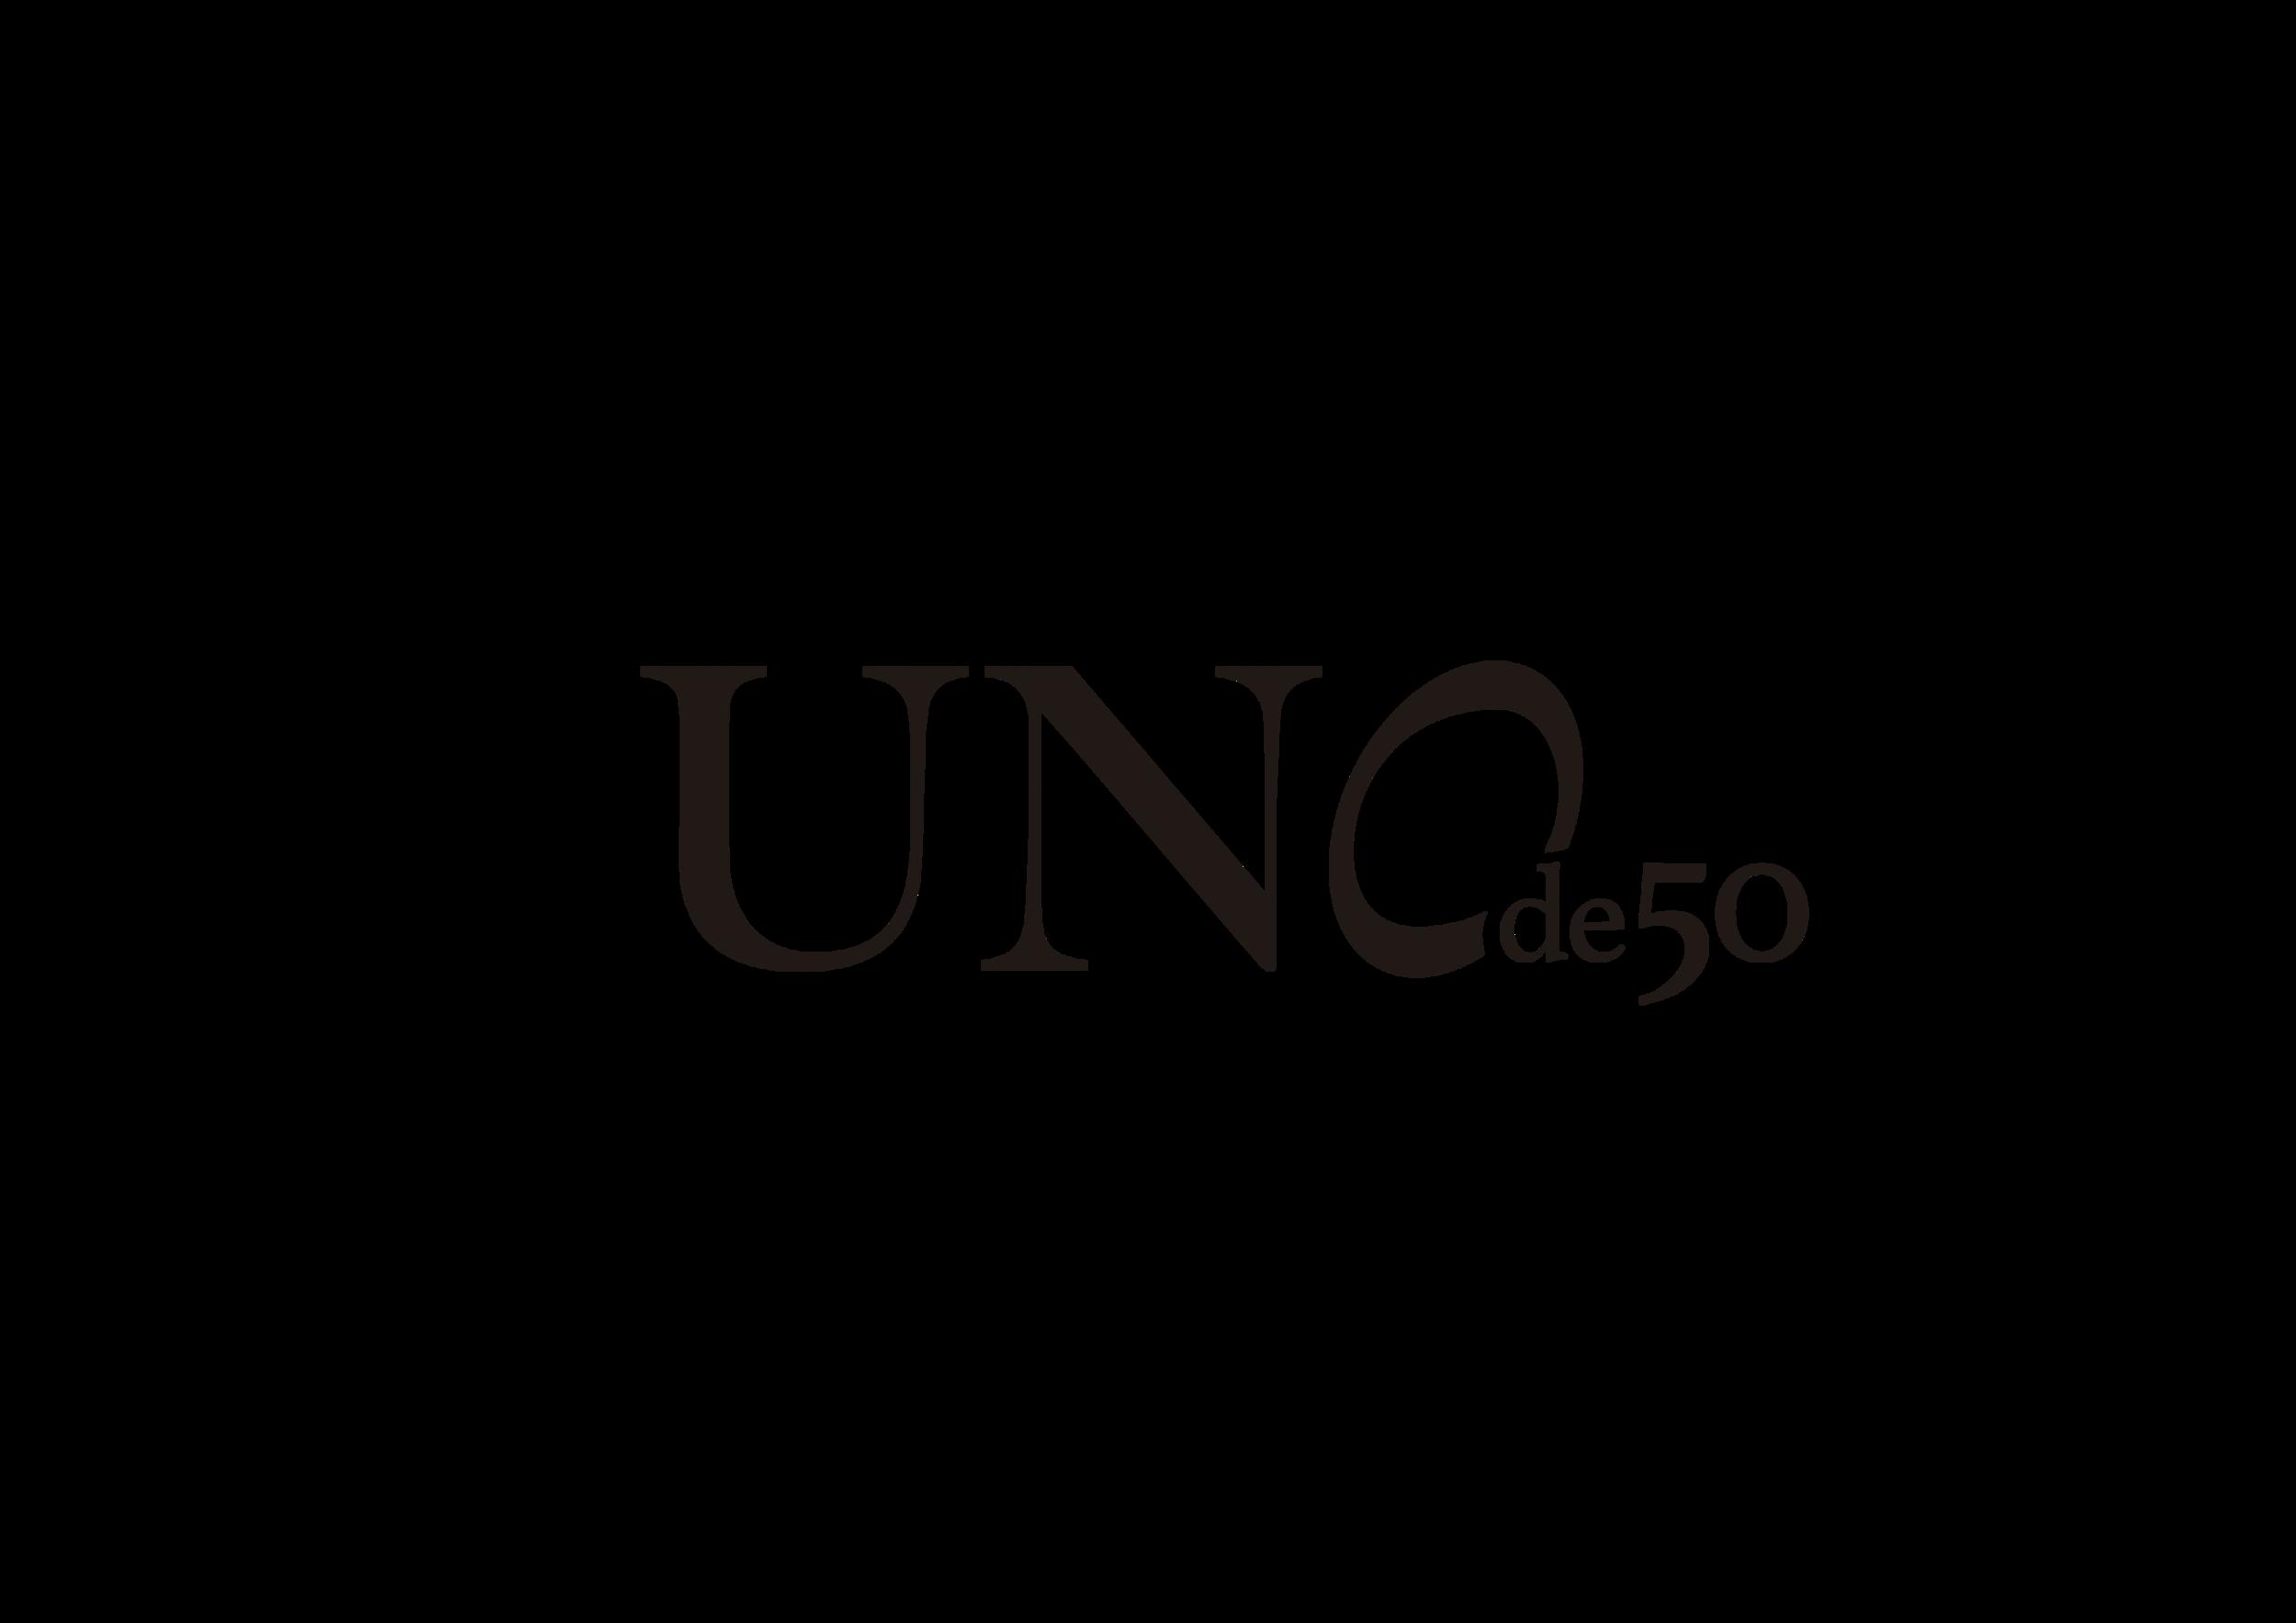 00_unode50-logotipo-negro.png